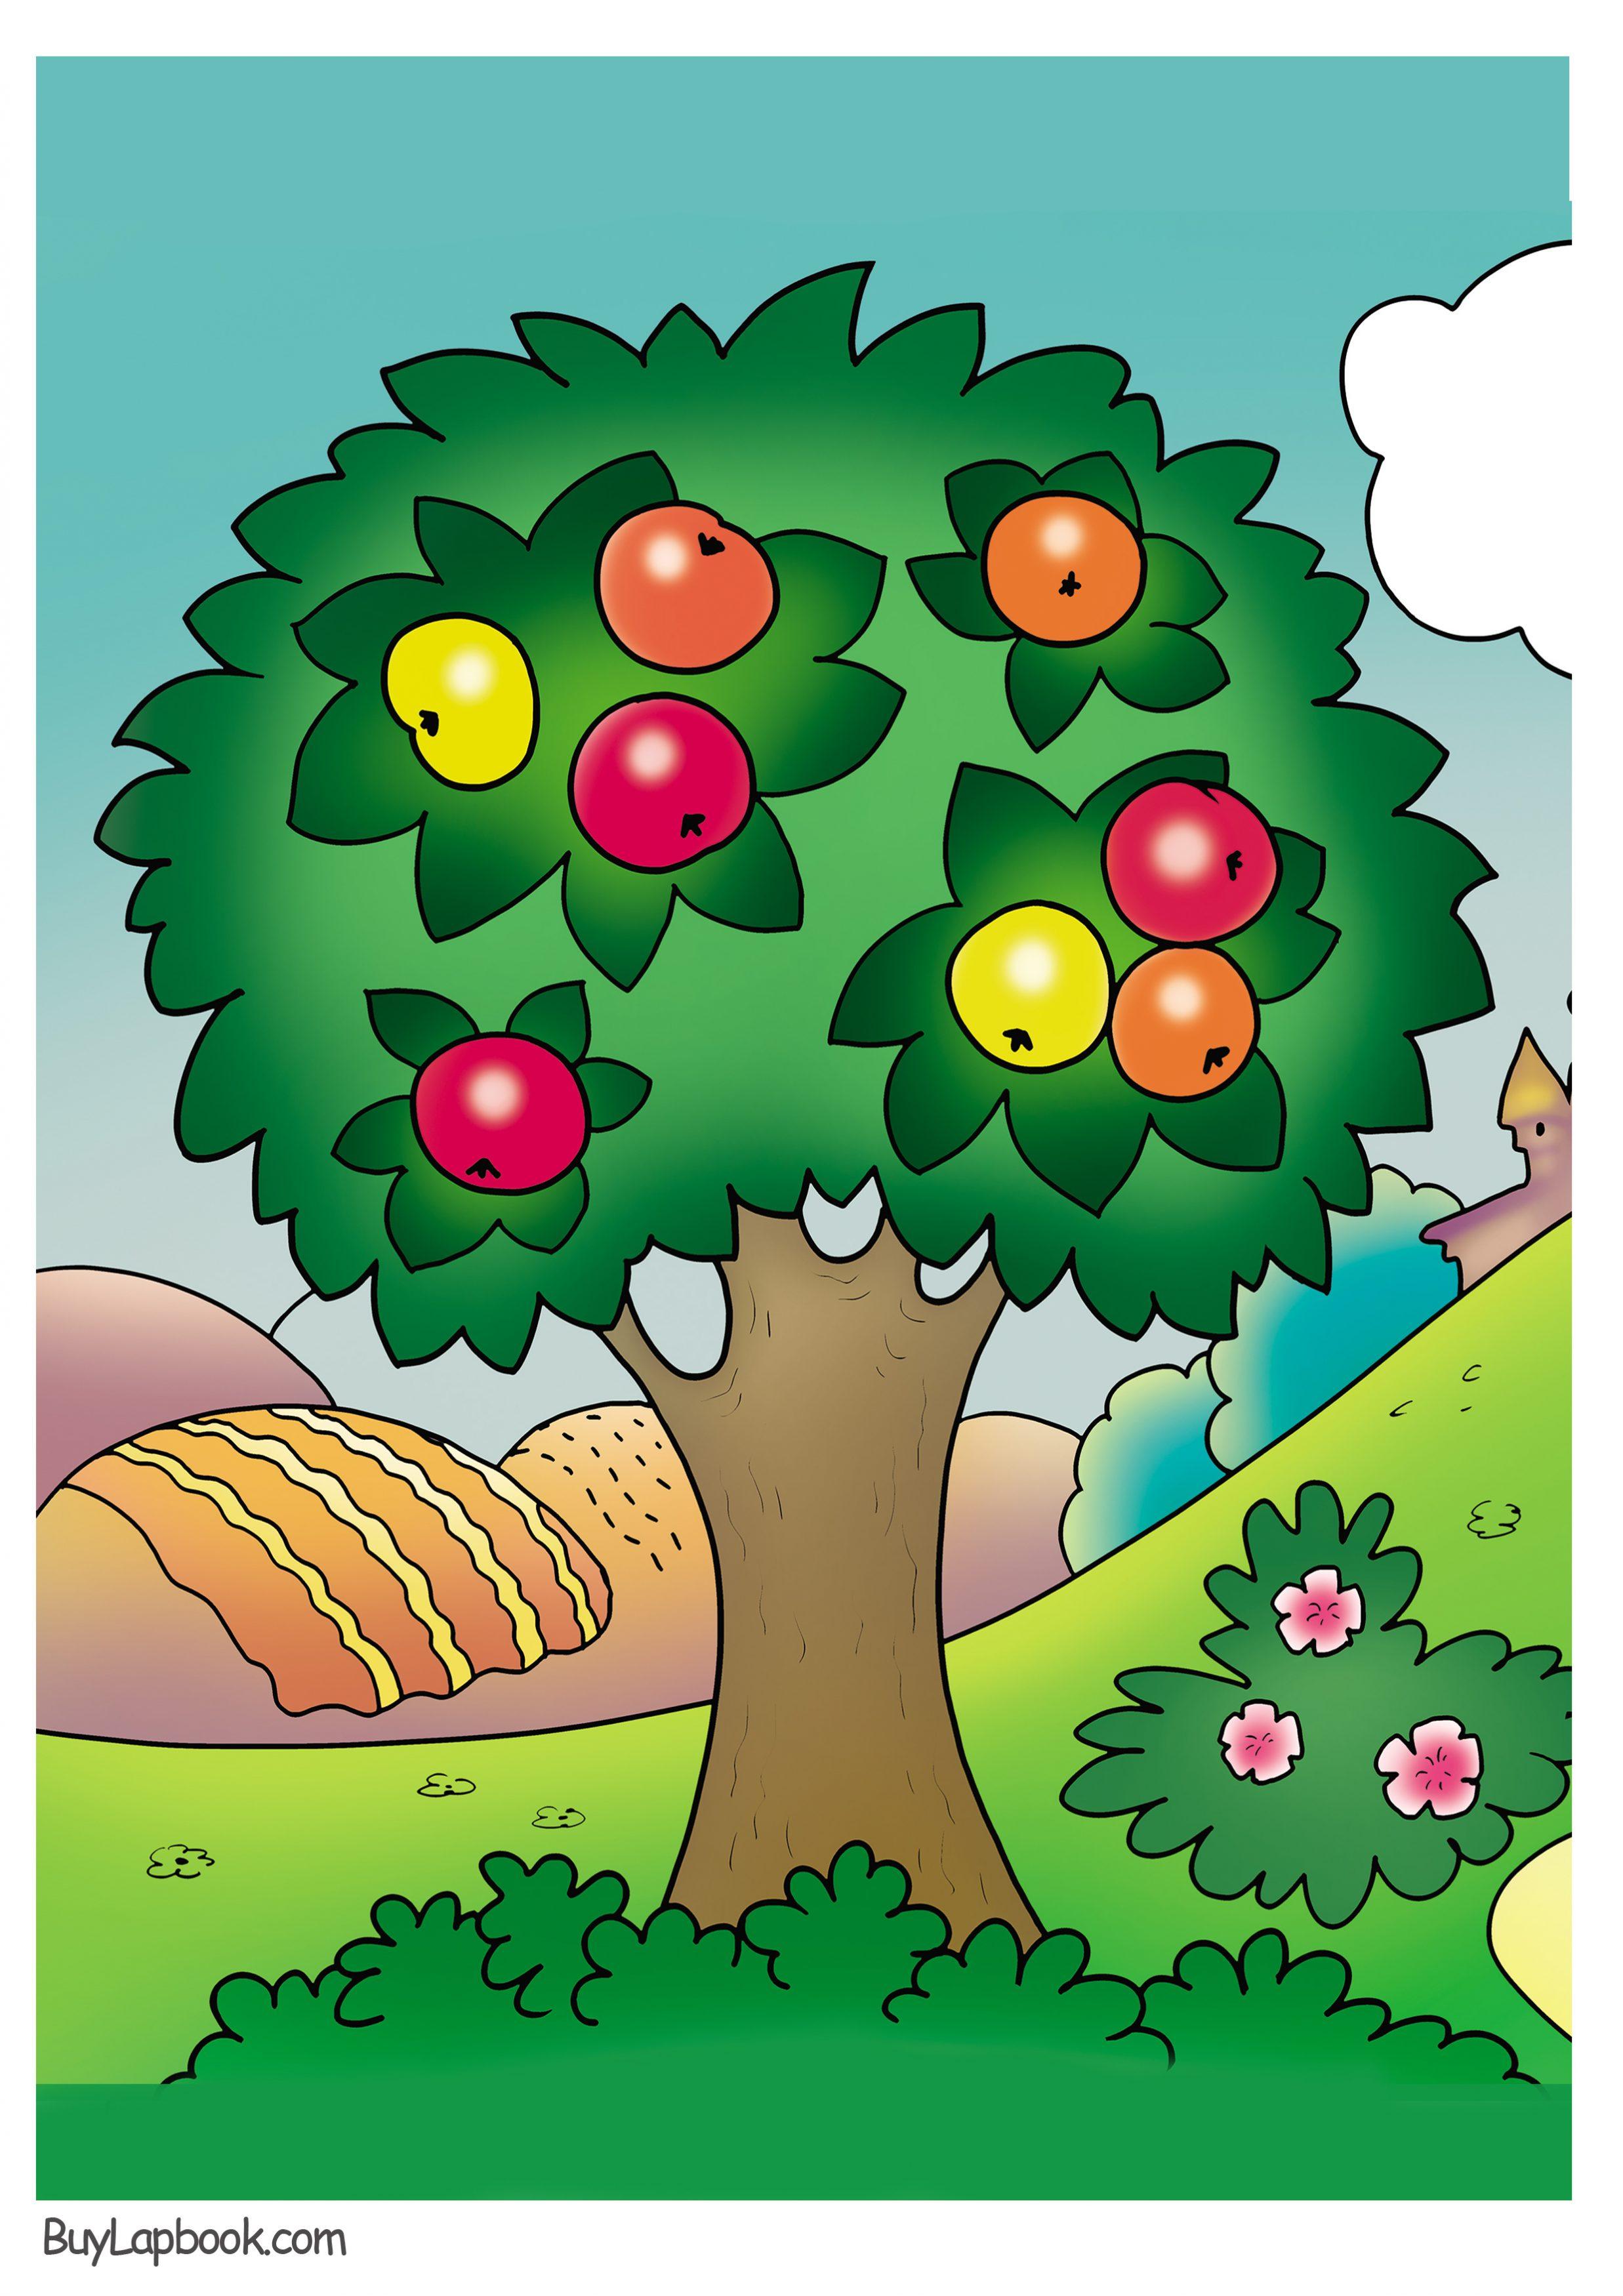 Apple Tree Coloring Page Free Printable Buylapbook